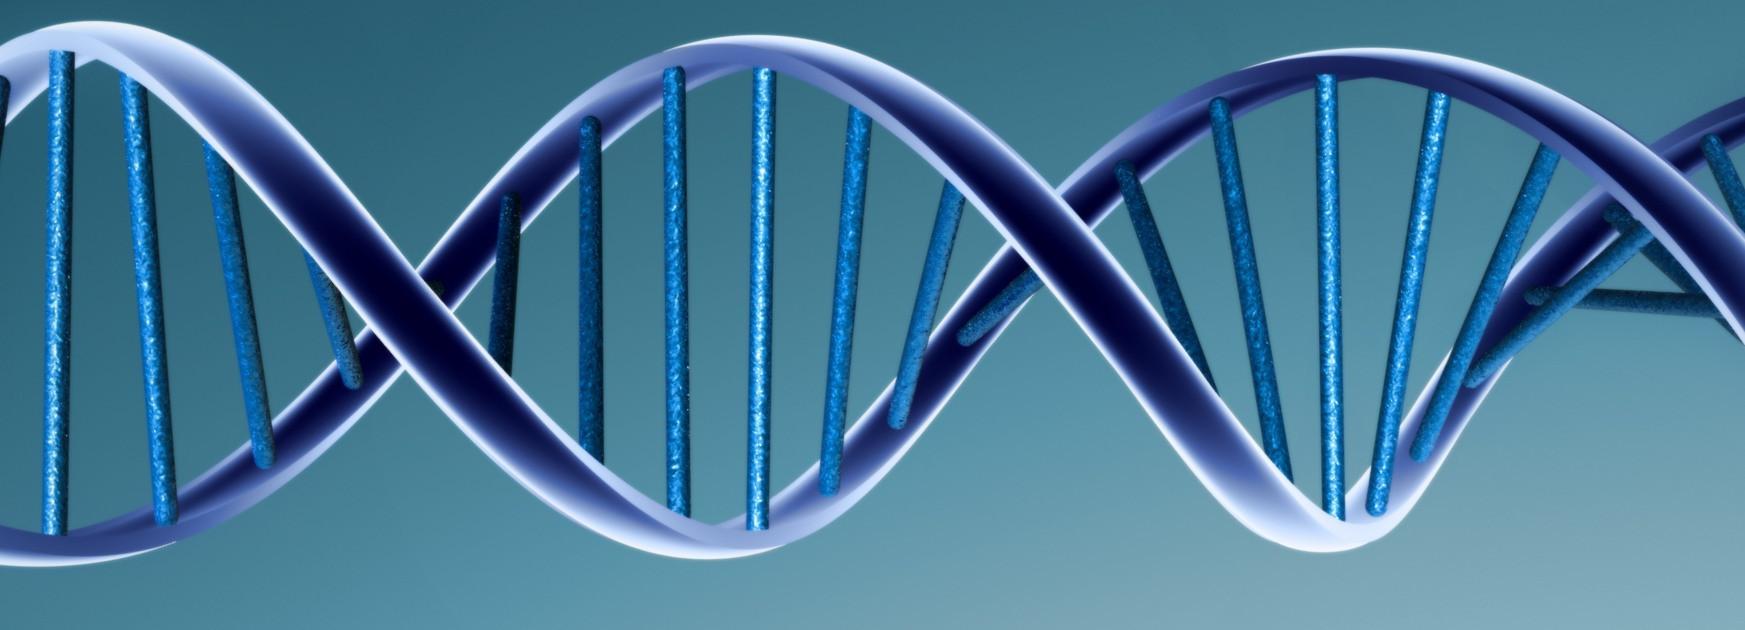 DNA | sciencemomma